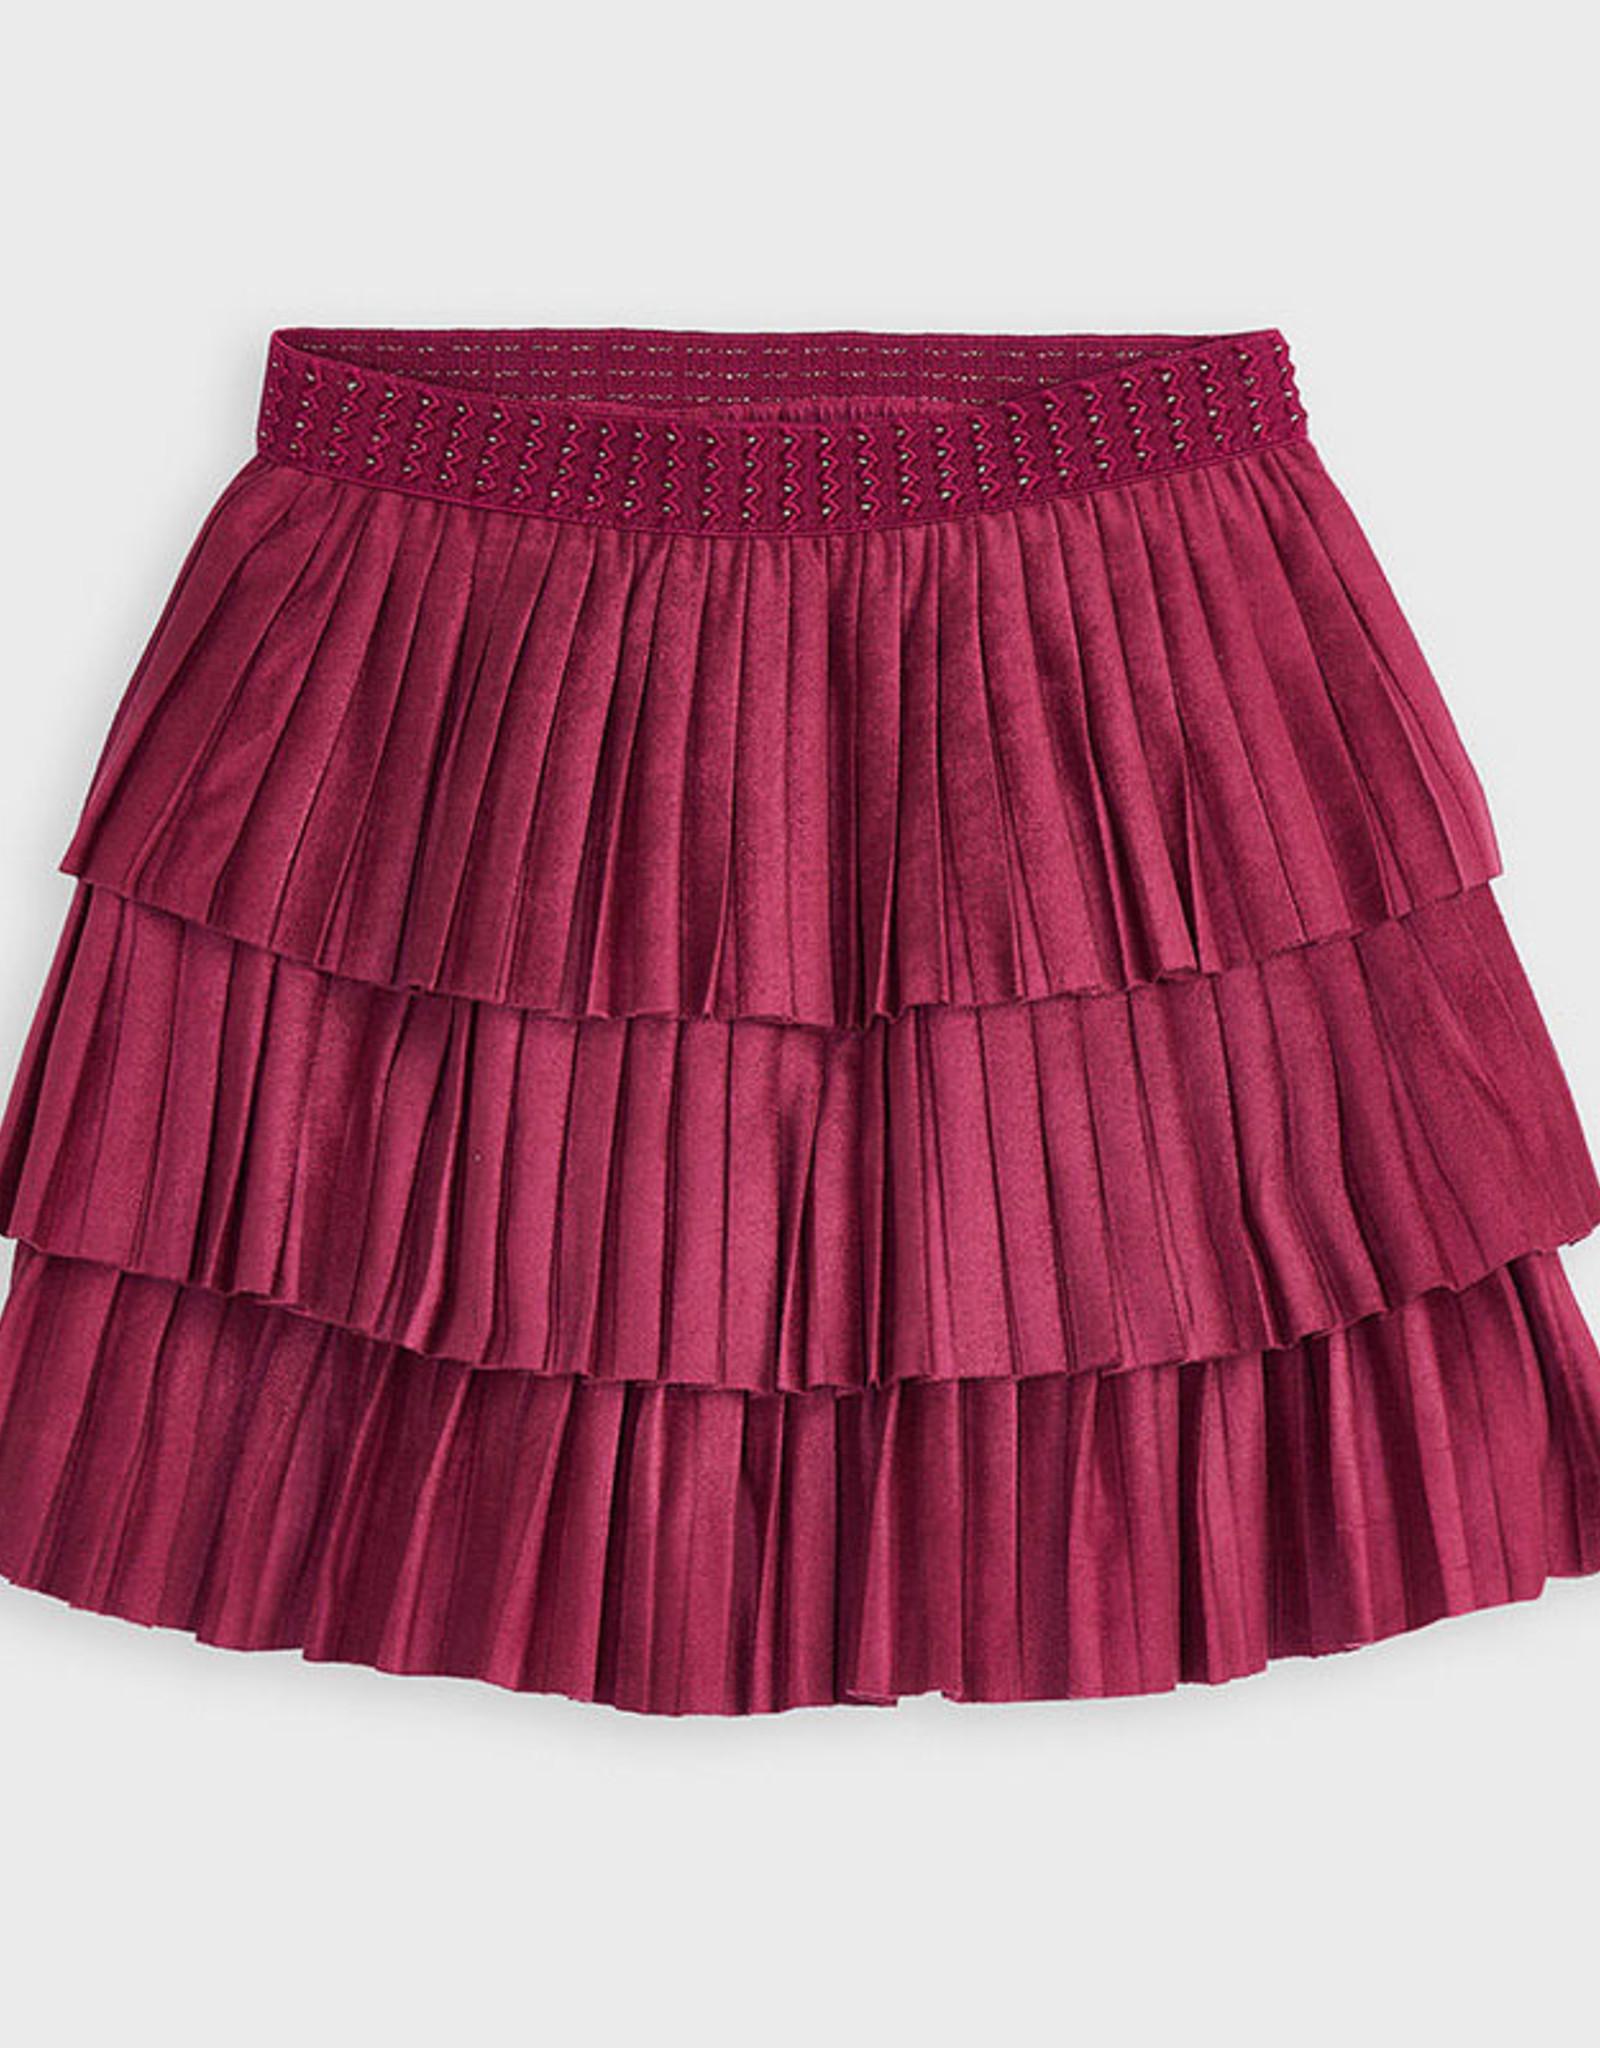 Mayoral Twirl Skirt